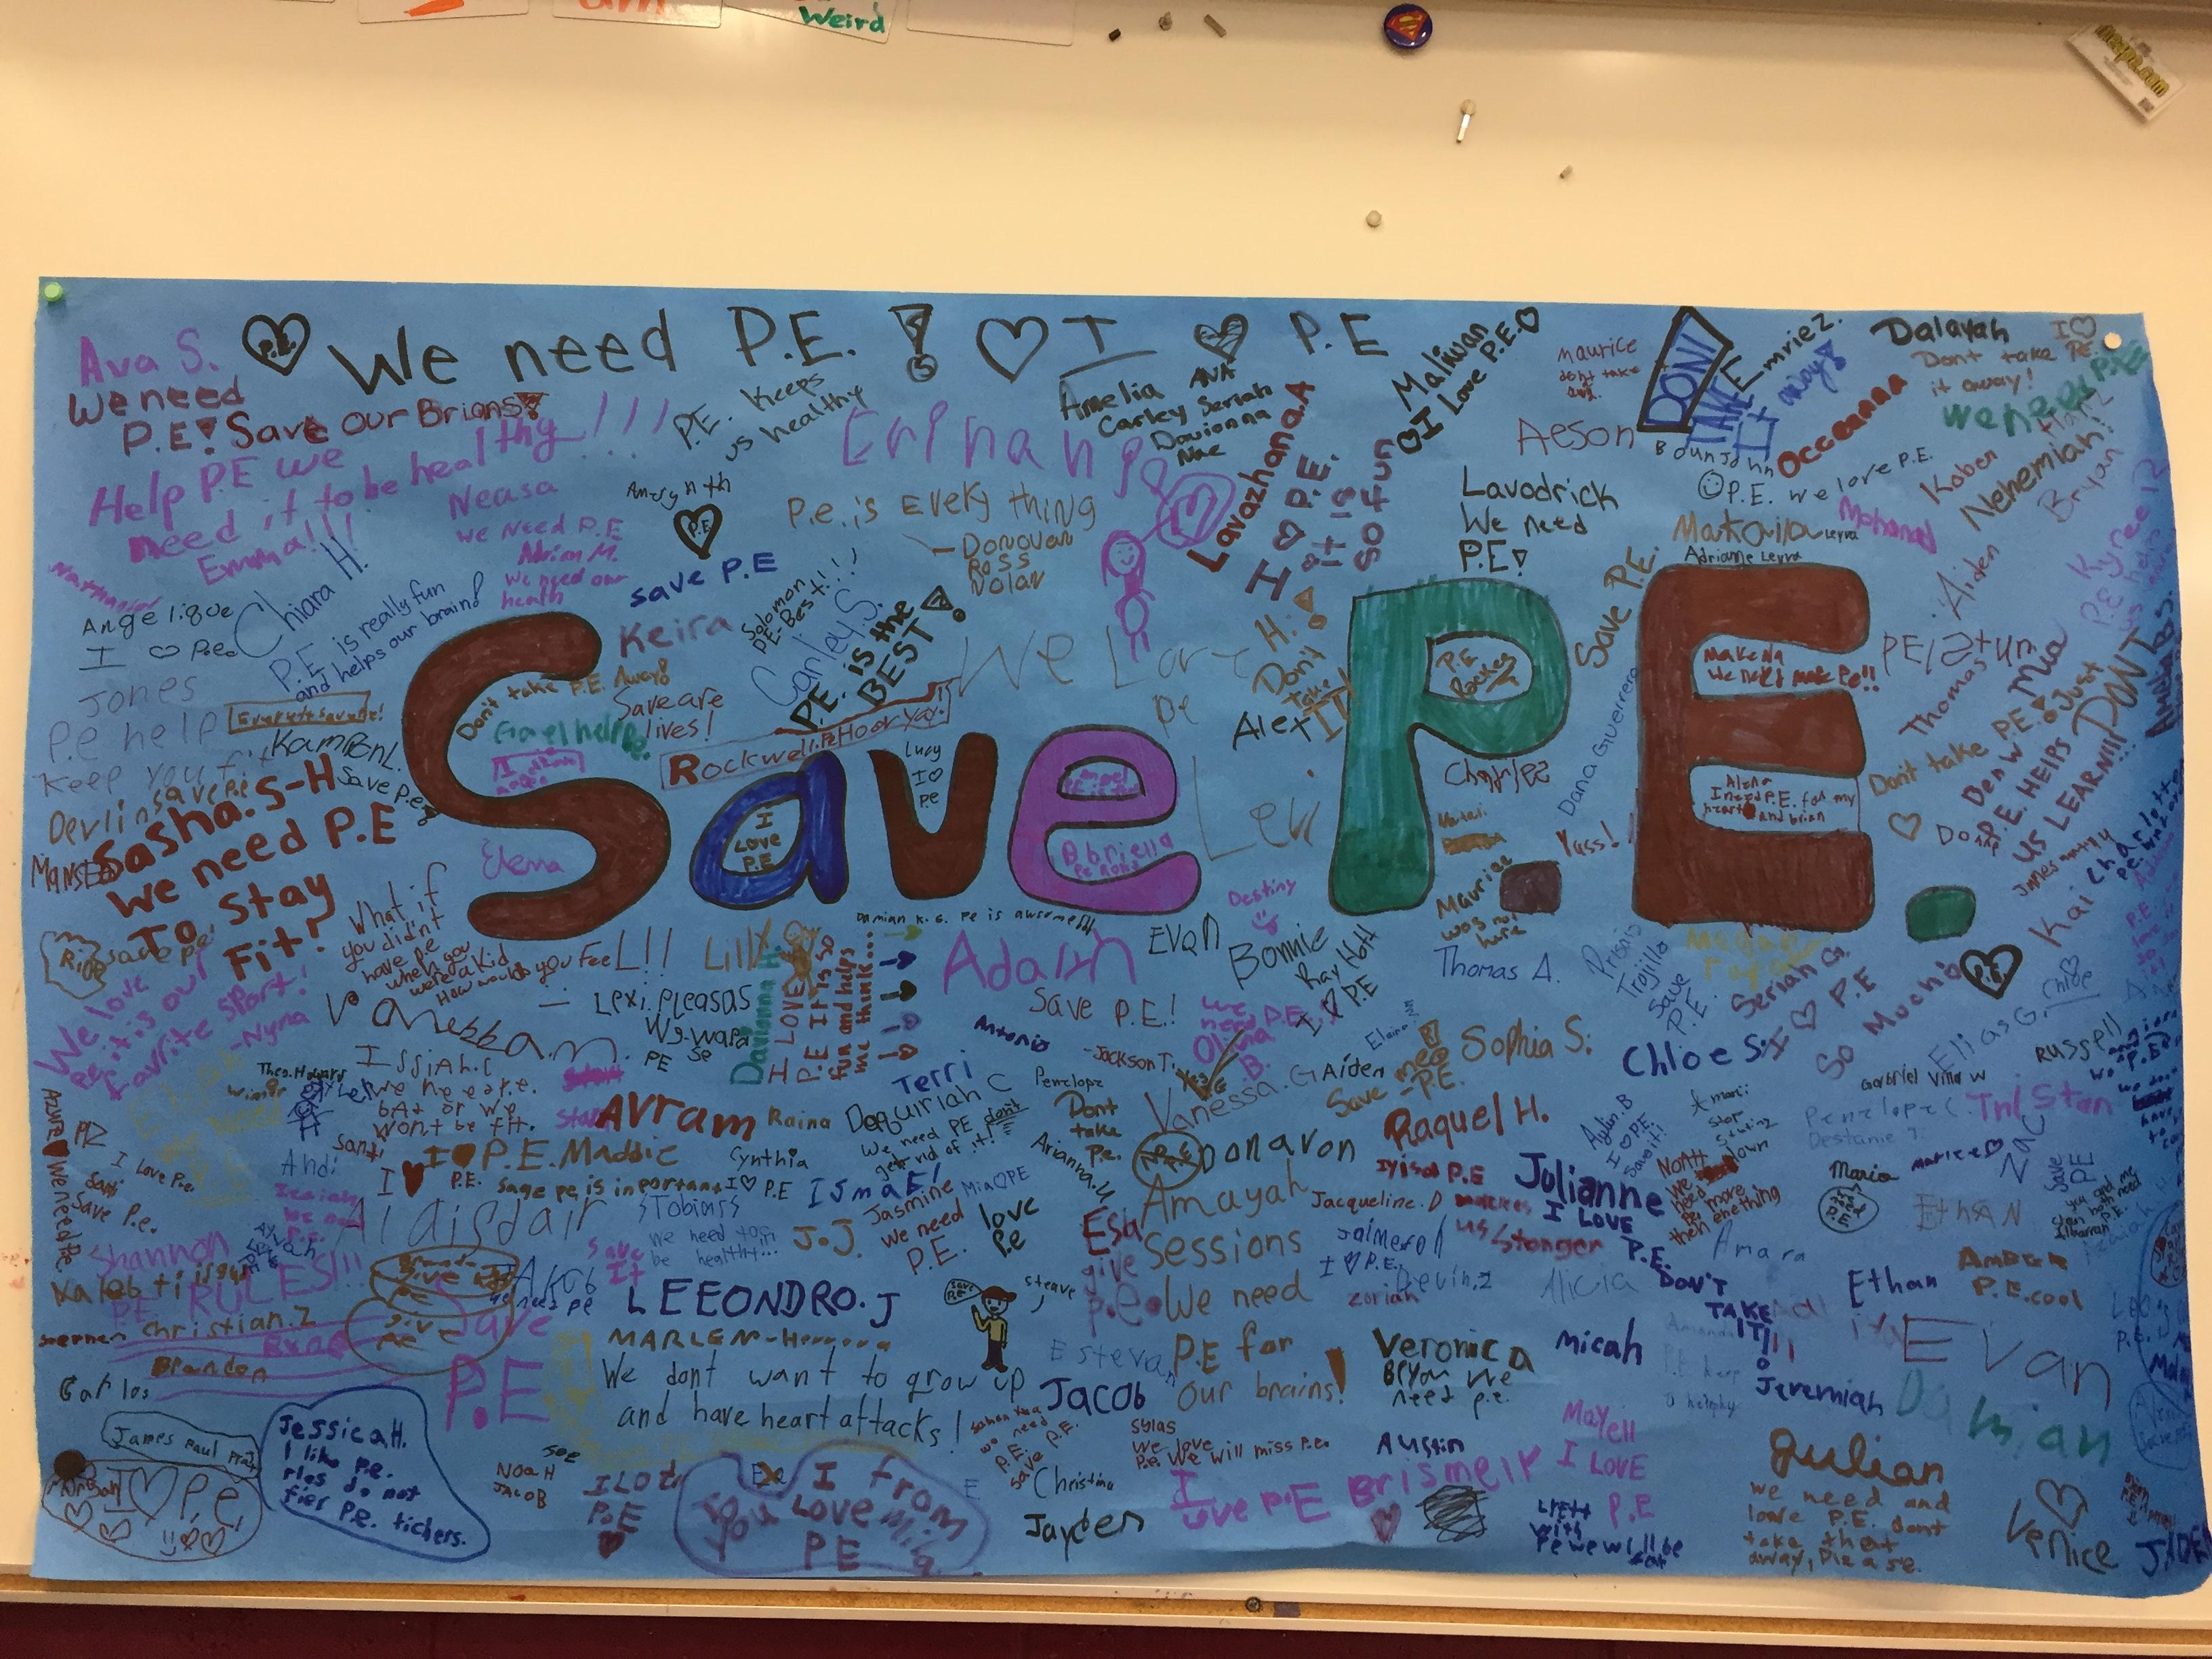 Save P.E.